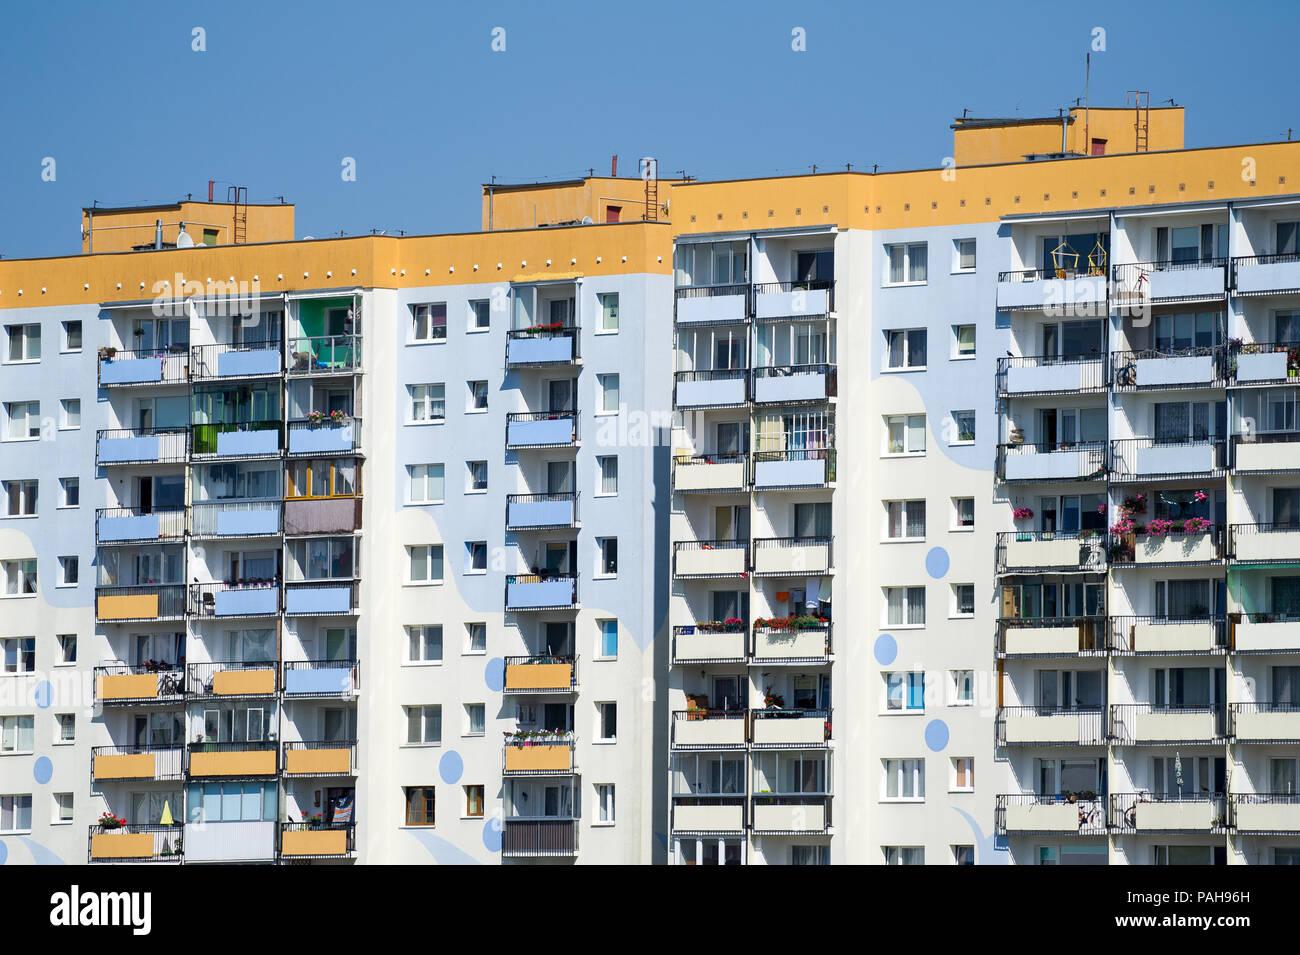 Communist era apartment buildings in Gdansk Zaspa, Poland. July 20th 2018 © Wojciech Strozyk / Alamy Stock Photo - Stock Image